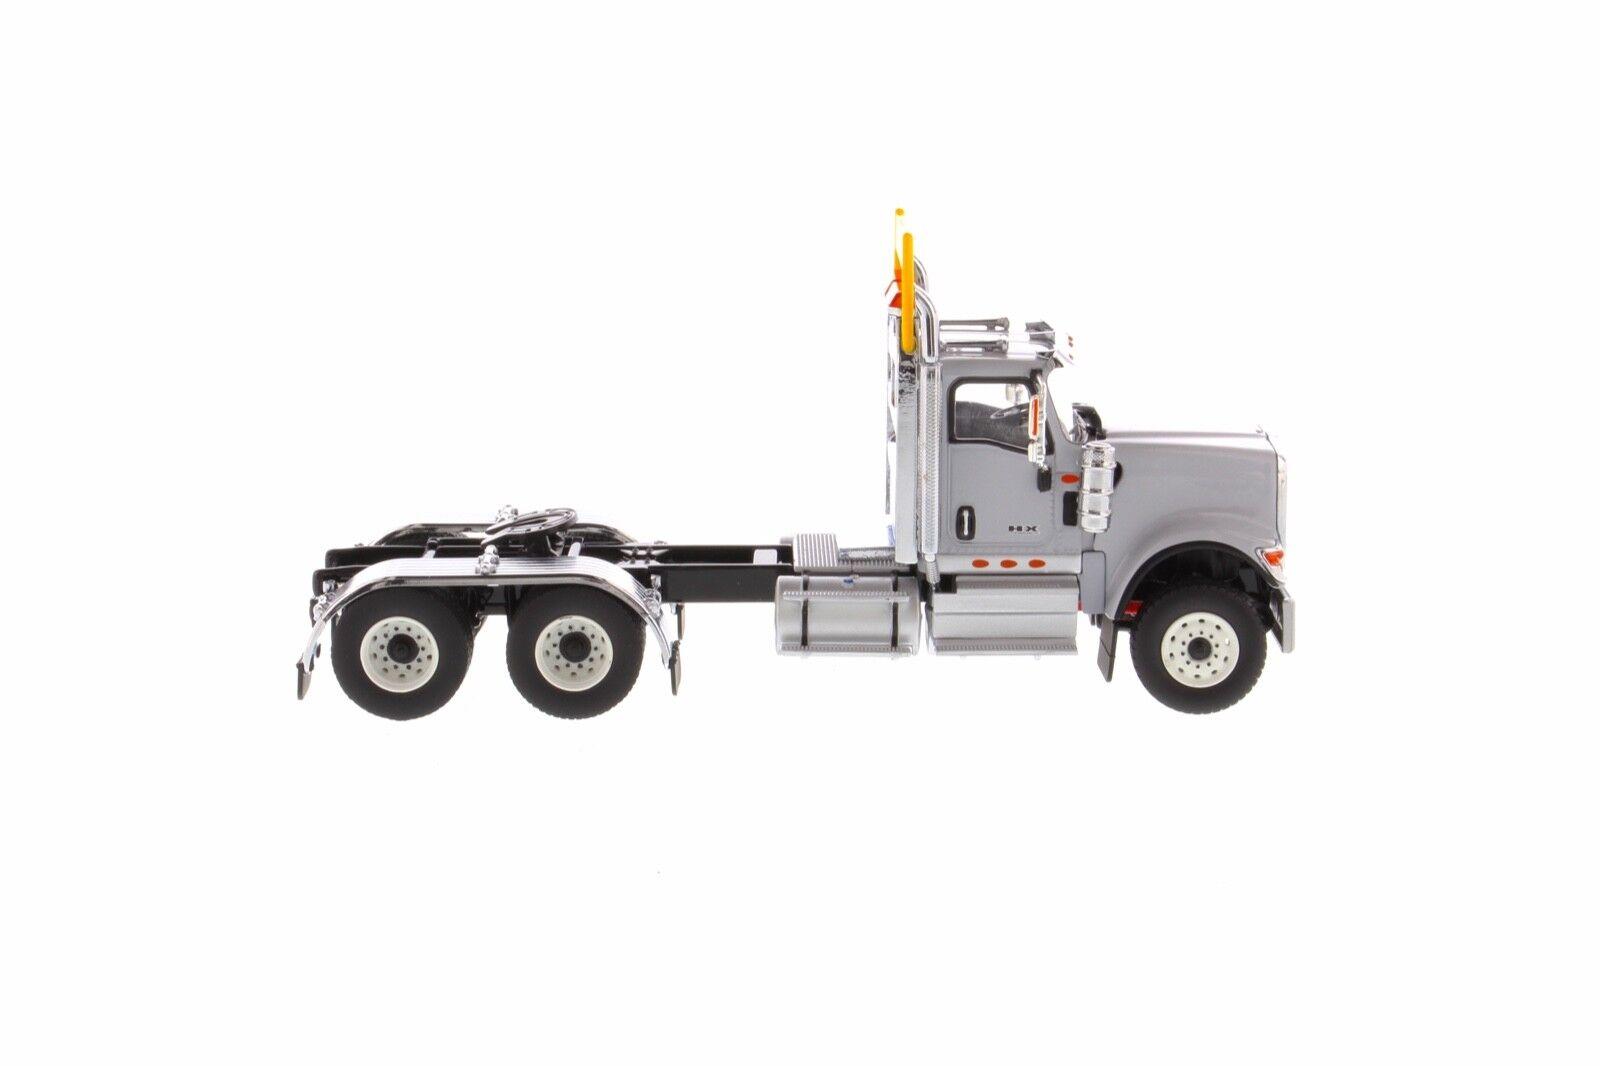 International 1 50 escala escala escala HX520 gris tándem Tractor-Diecast Masters 71005 156050